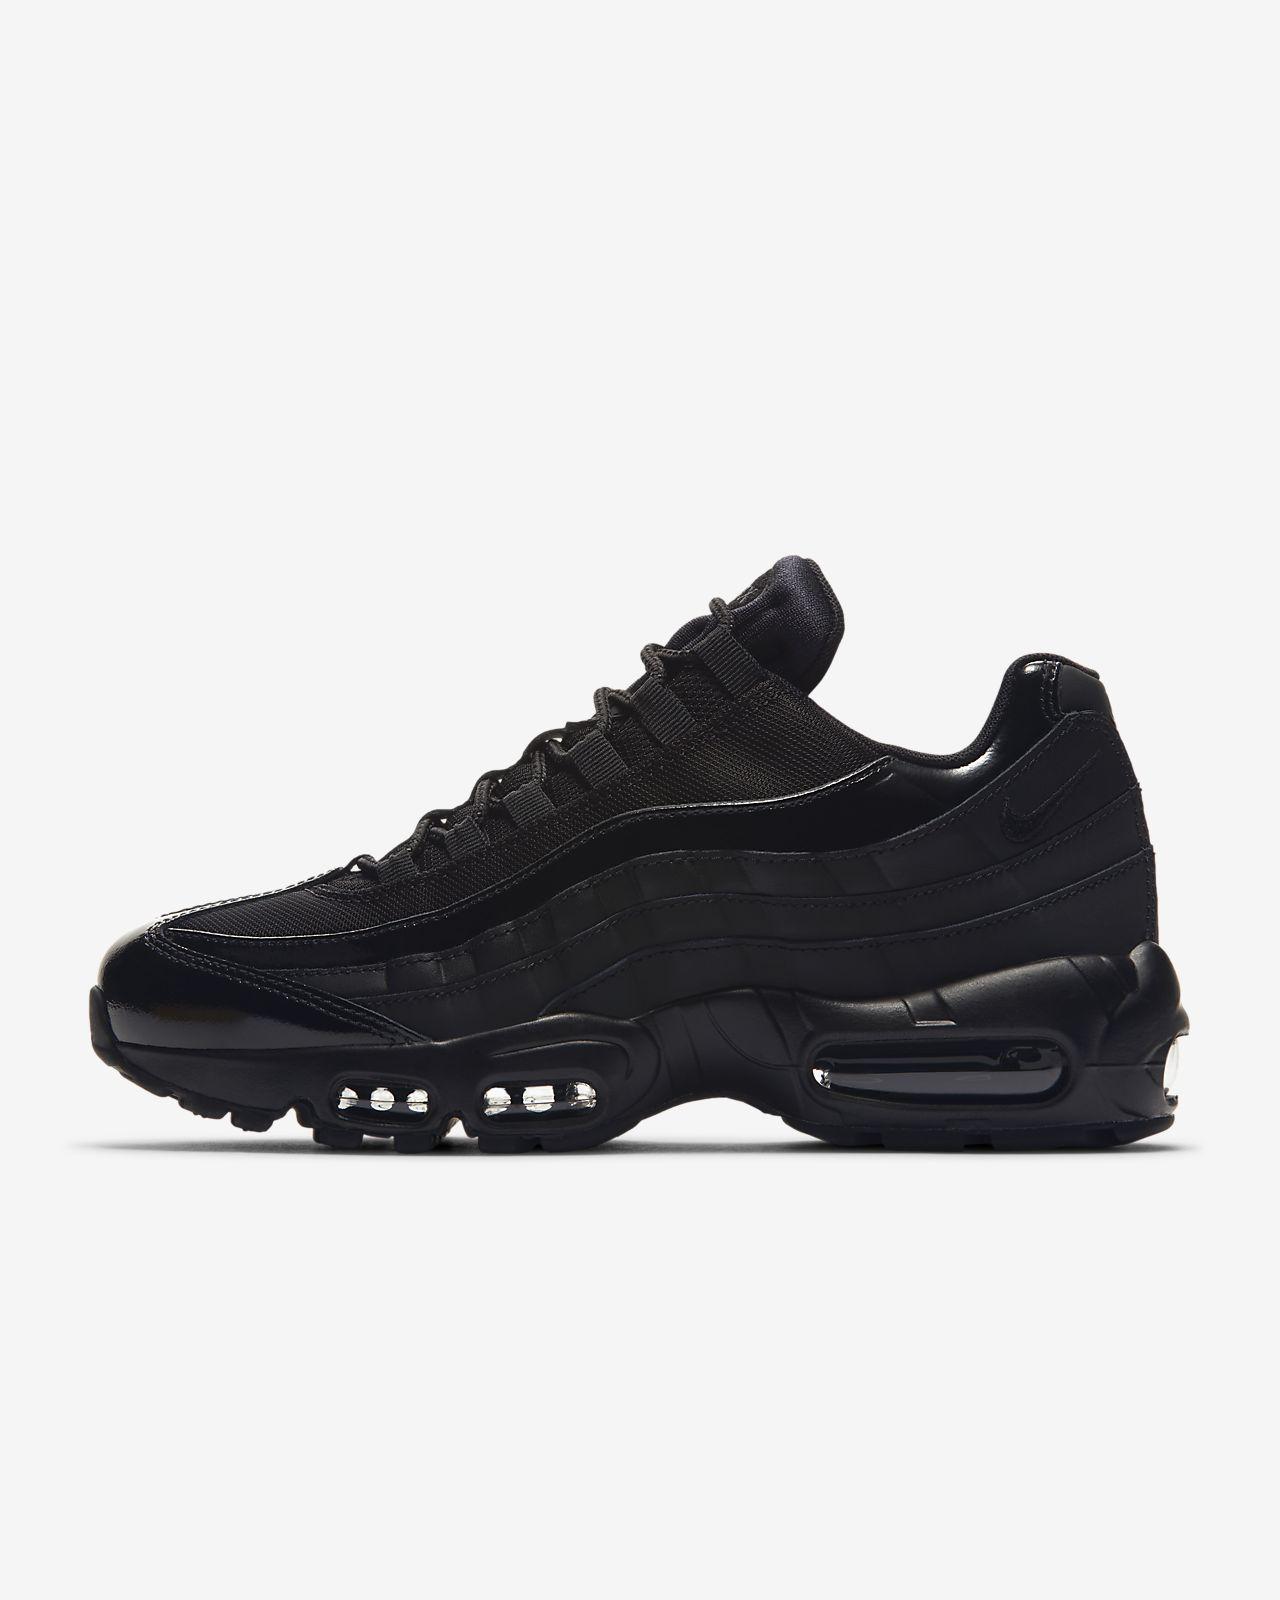 Nike Air Max 95 Essential Black White Grey